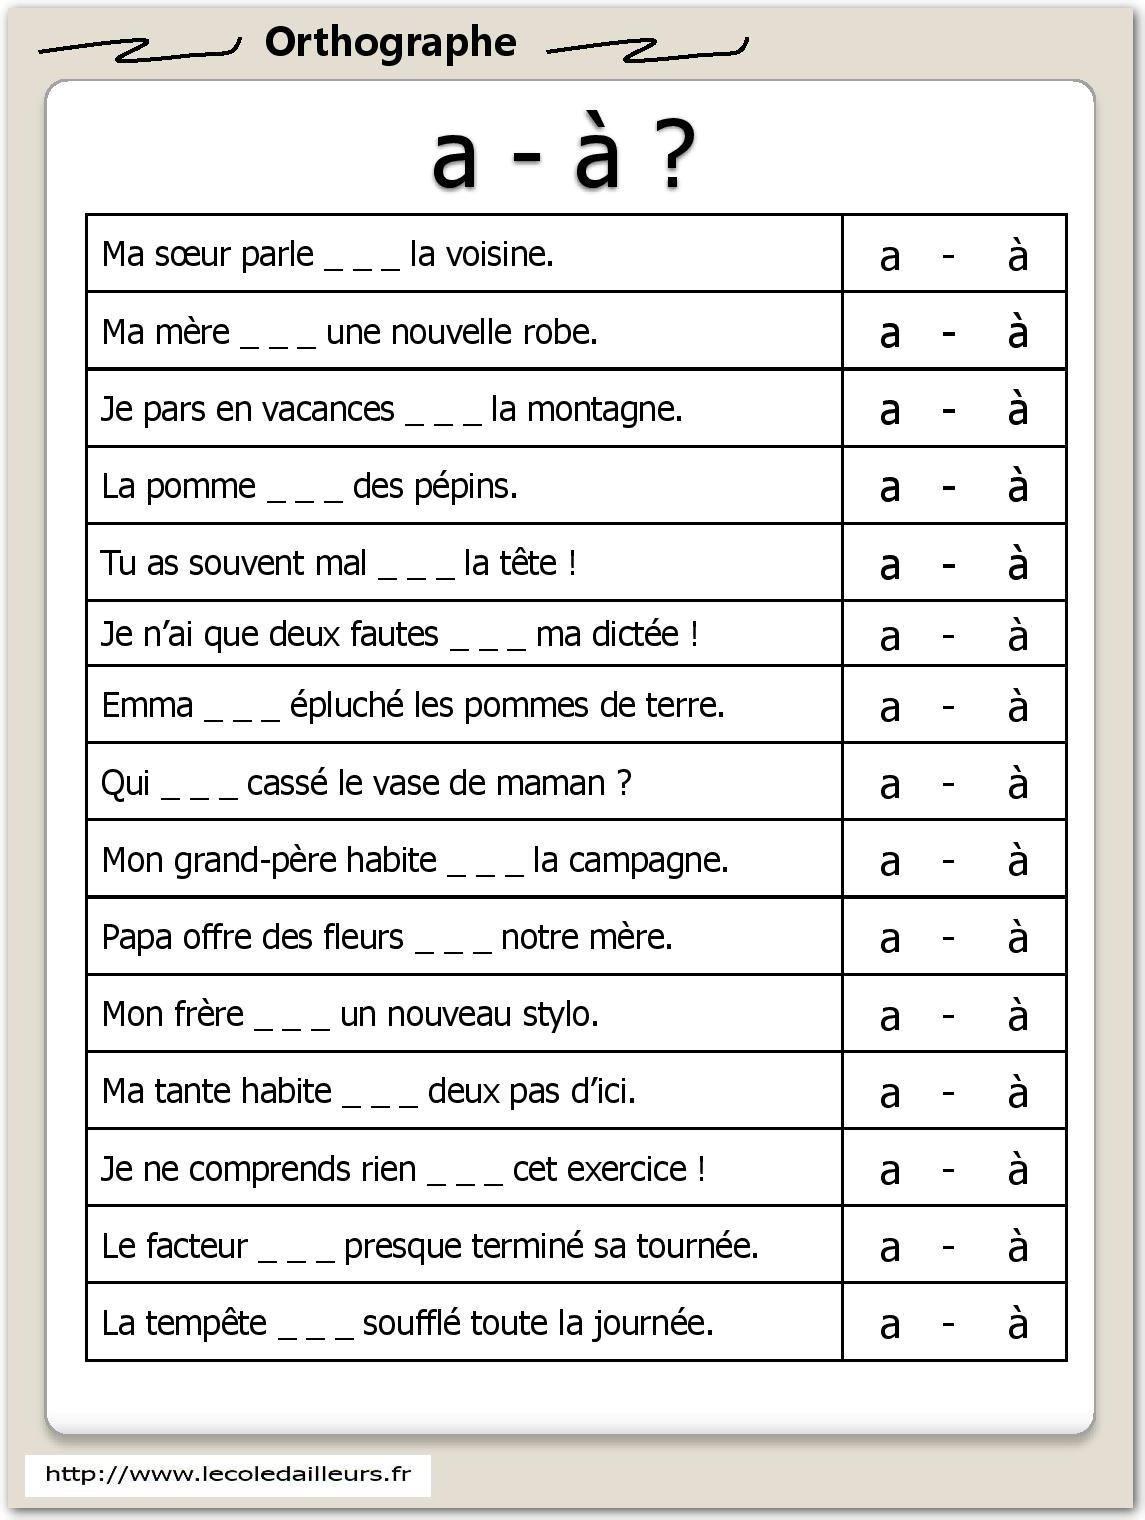 Orthographe Archives - L'école d'Ailleurs | Exercices orthographe, Exercice francais ce2 ...